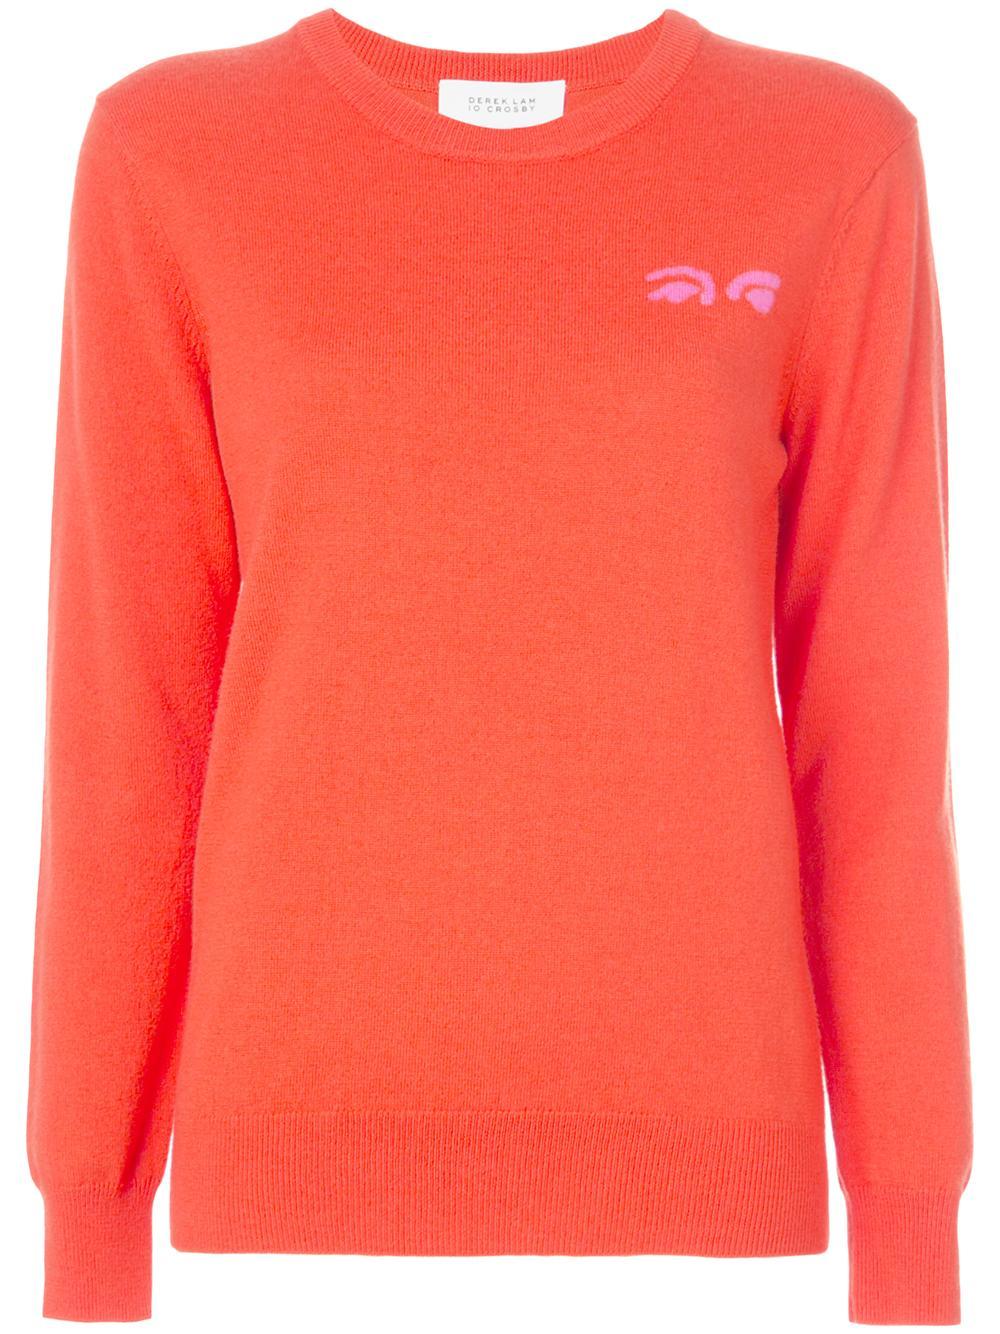 Crewneck Sweater With Eyes Intarsia Item # TF91906MW